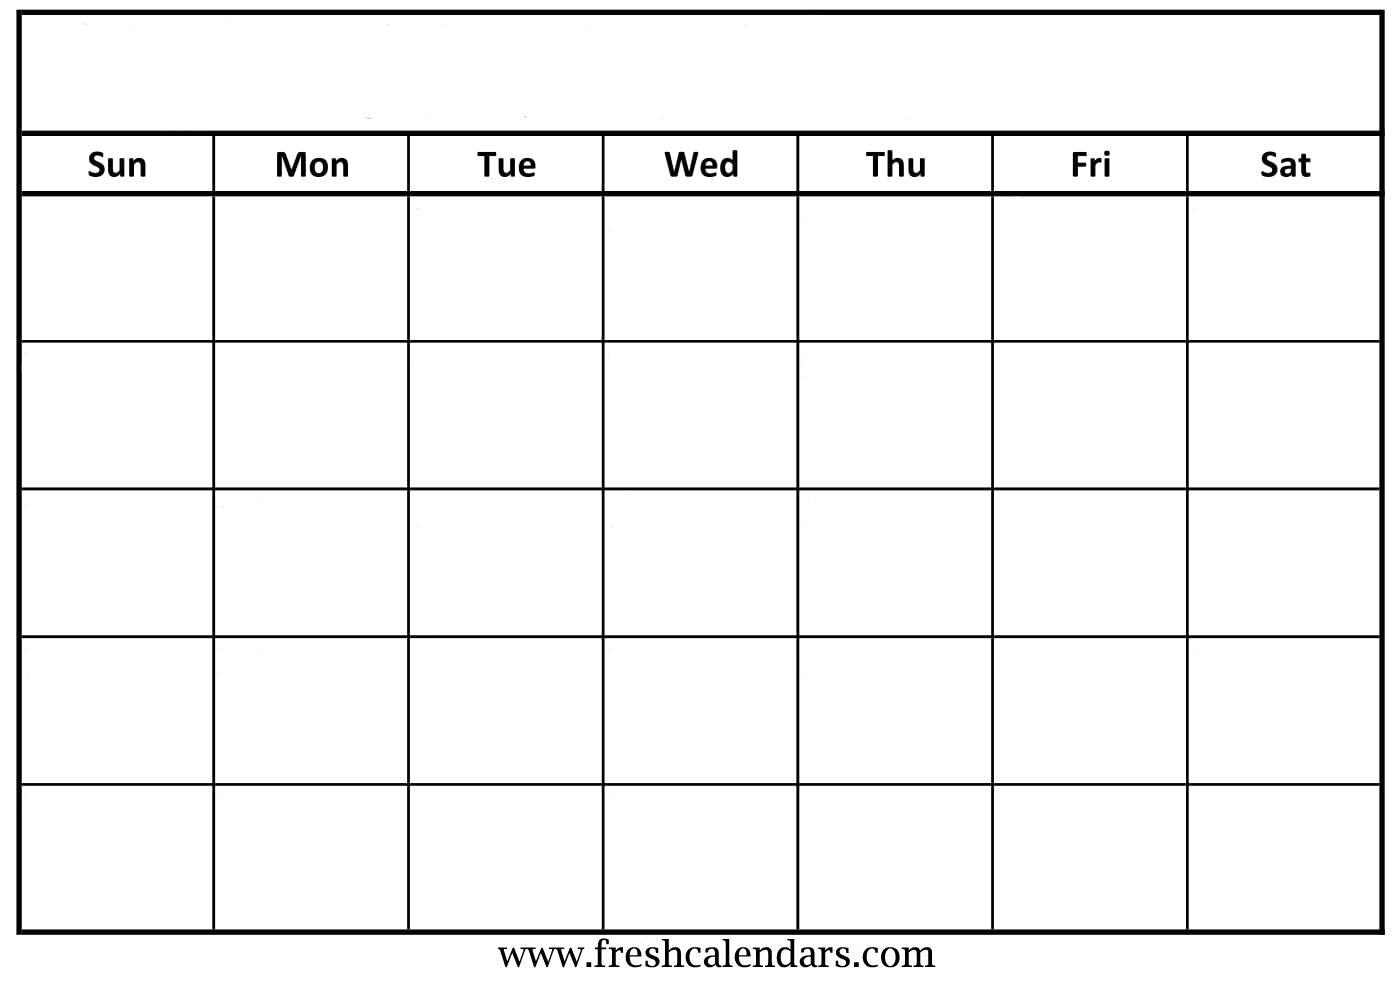 Printable Blank Calendars 2019